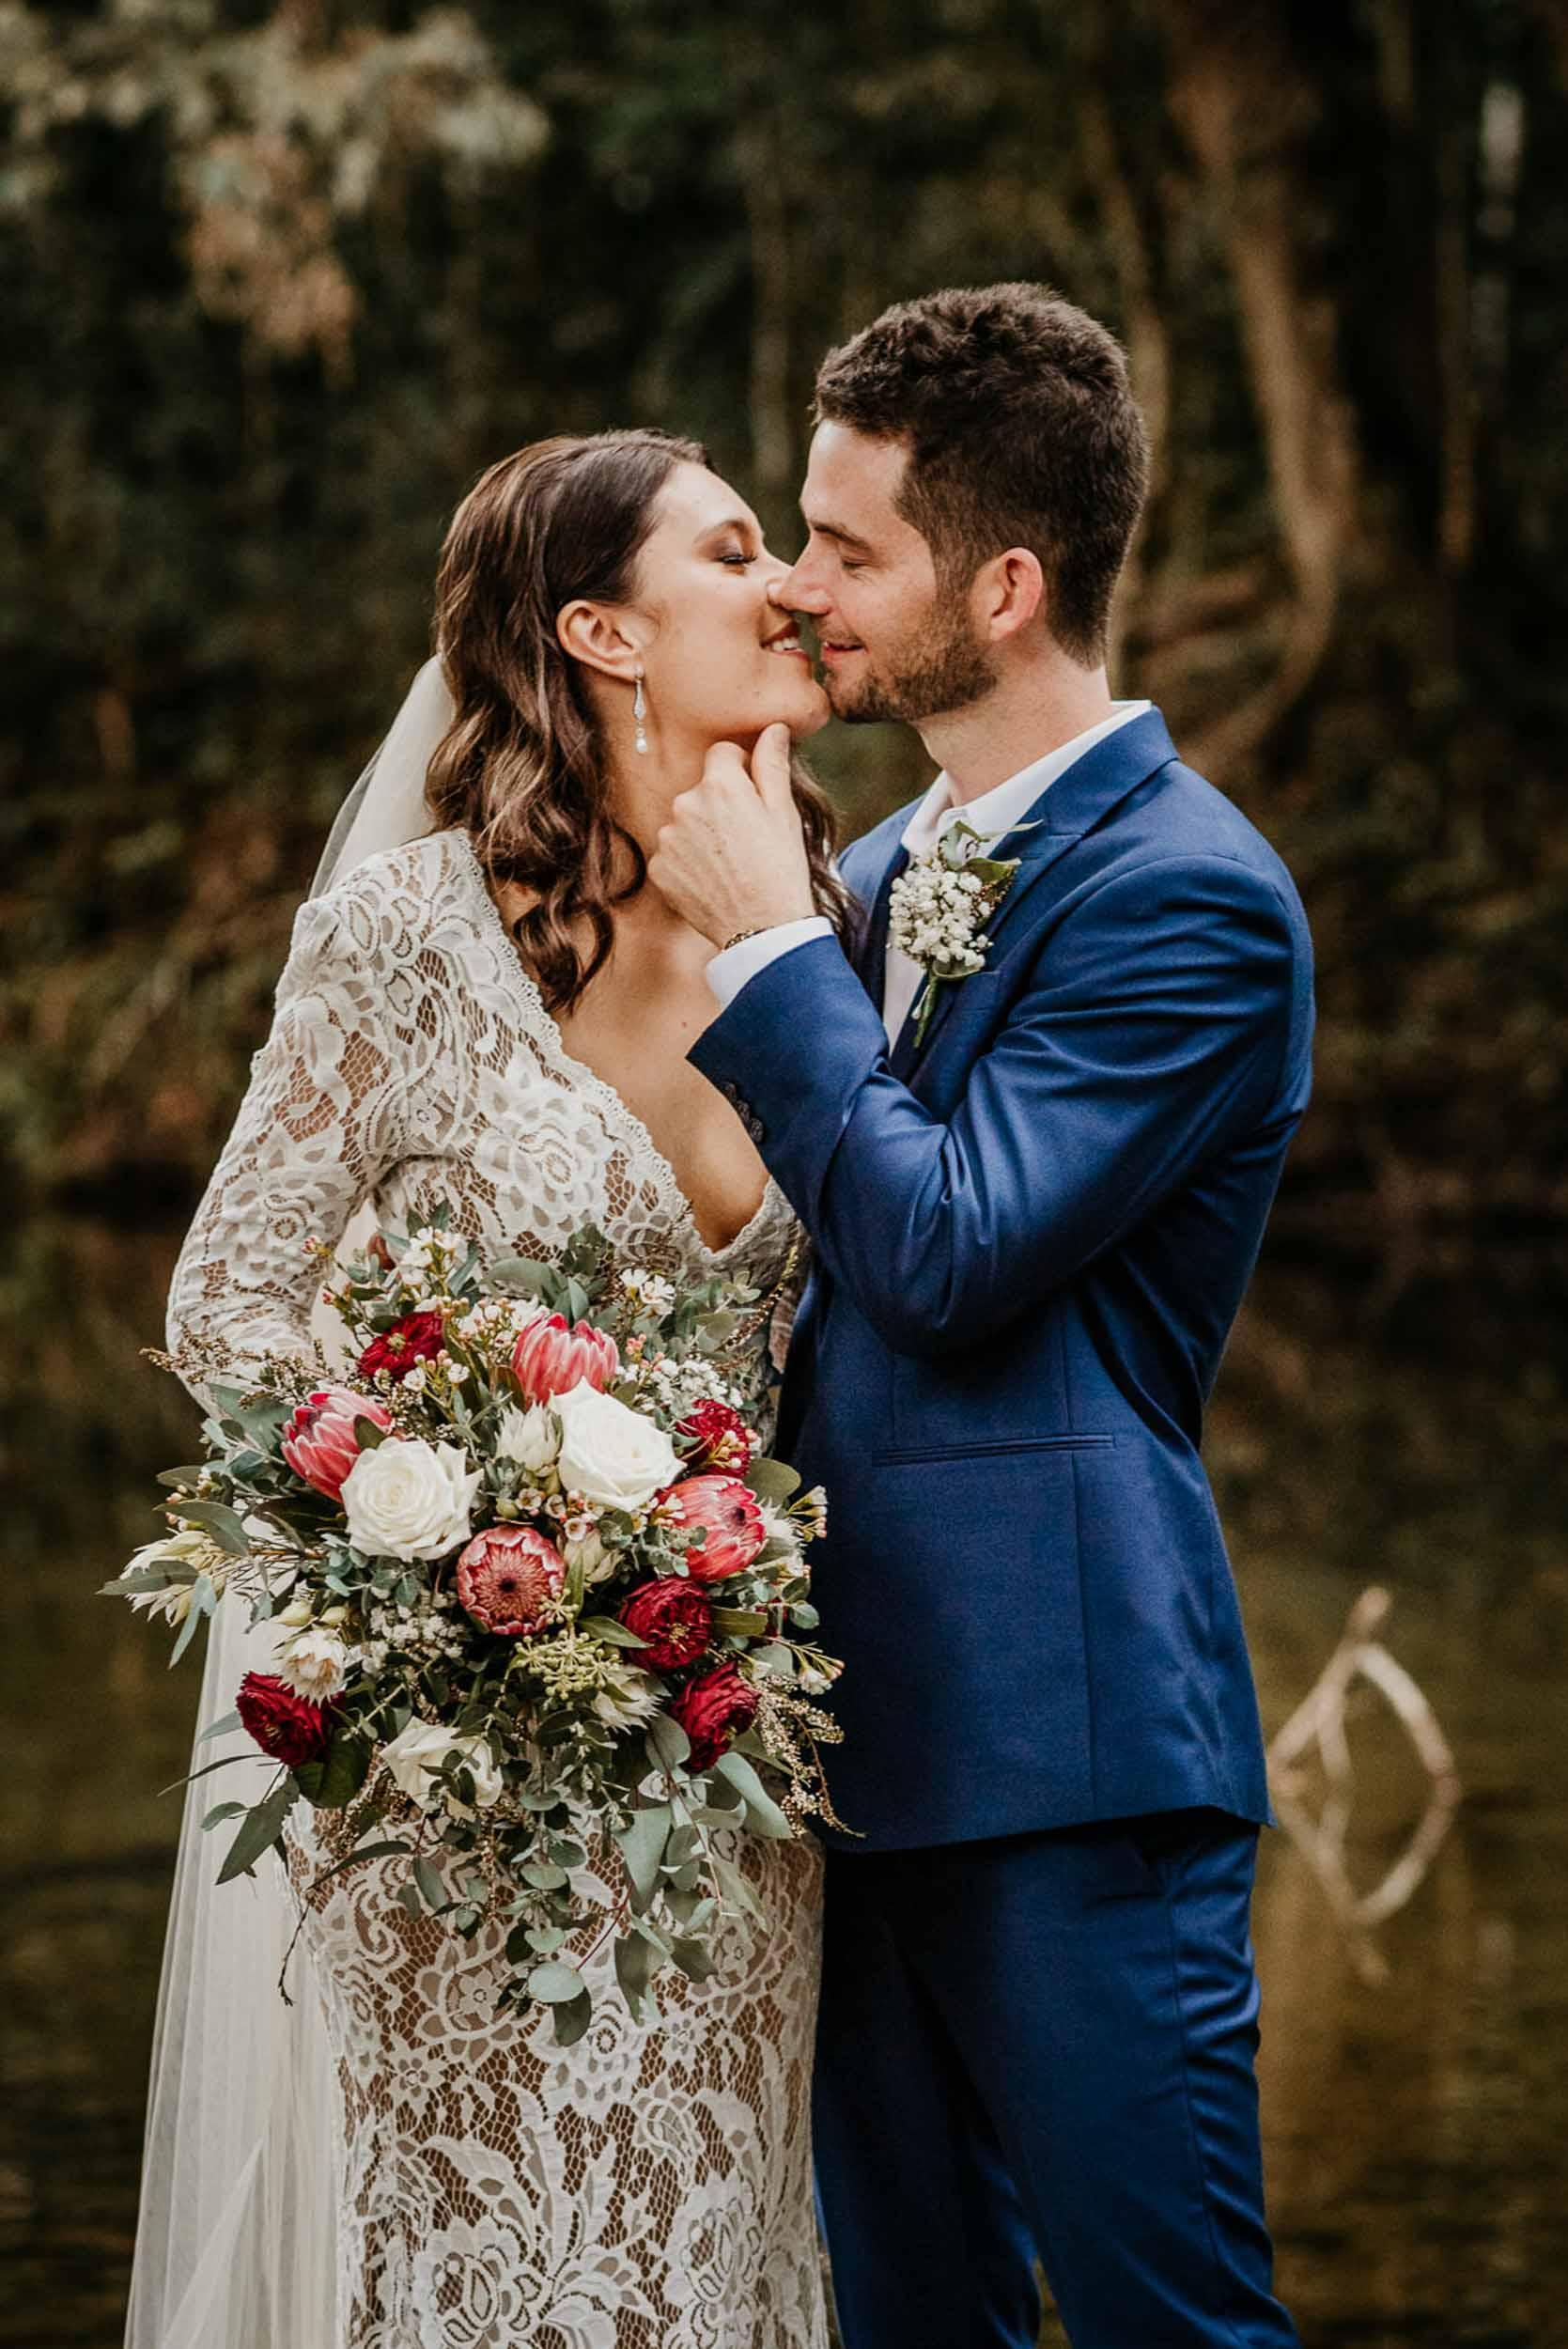 The Raw Photographer - Cairns Wedding Photographer - Laloli - Cairns Garden Wedding - Irene Costa's Devine Bridal-31.jpg